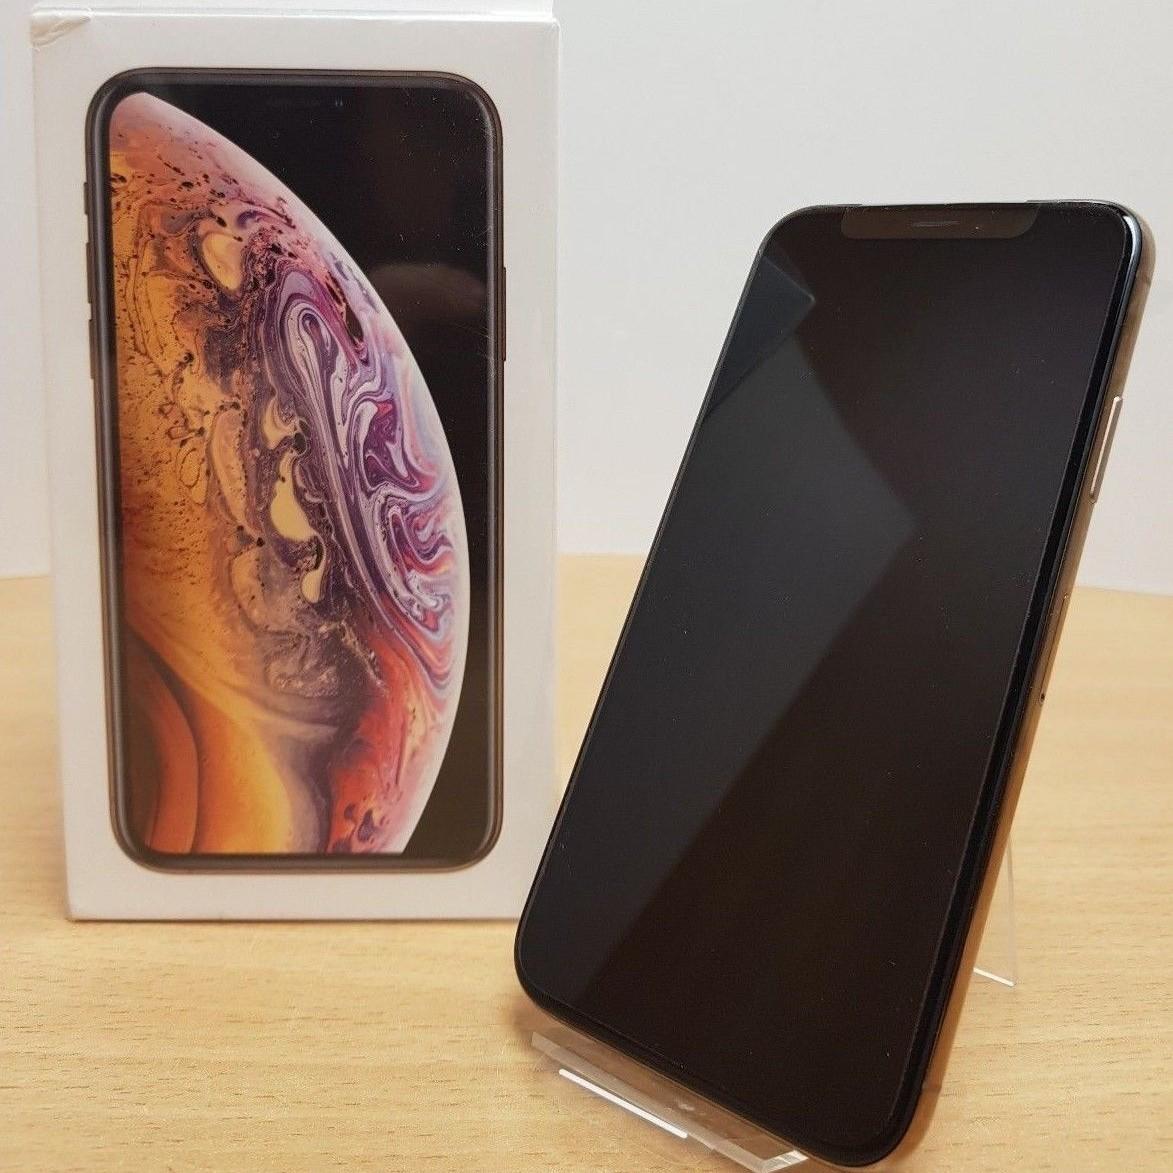 Apple iPhone XS 64GB = 400 EUR  ,iPhone XS Max 64GB = 430 EUR ,iPhone X 64GB 300 EUR,Apple iPhone XR